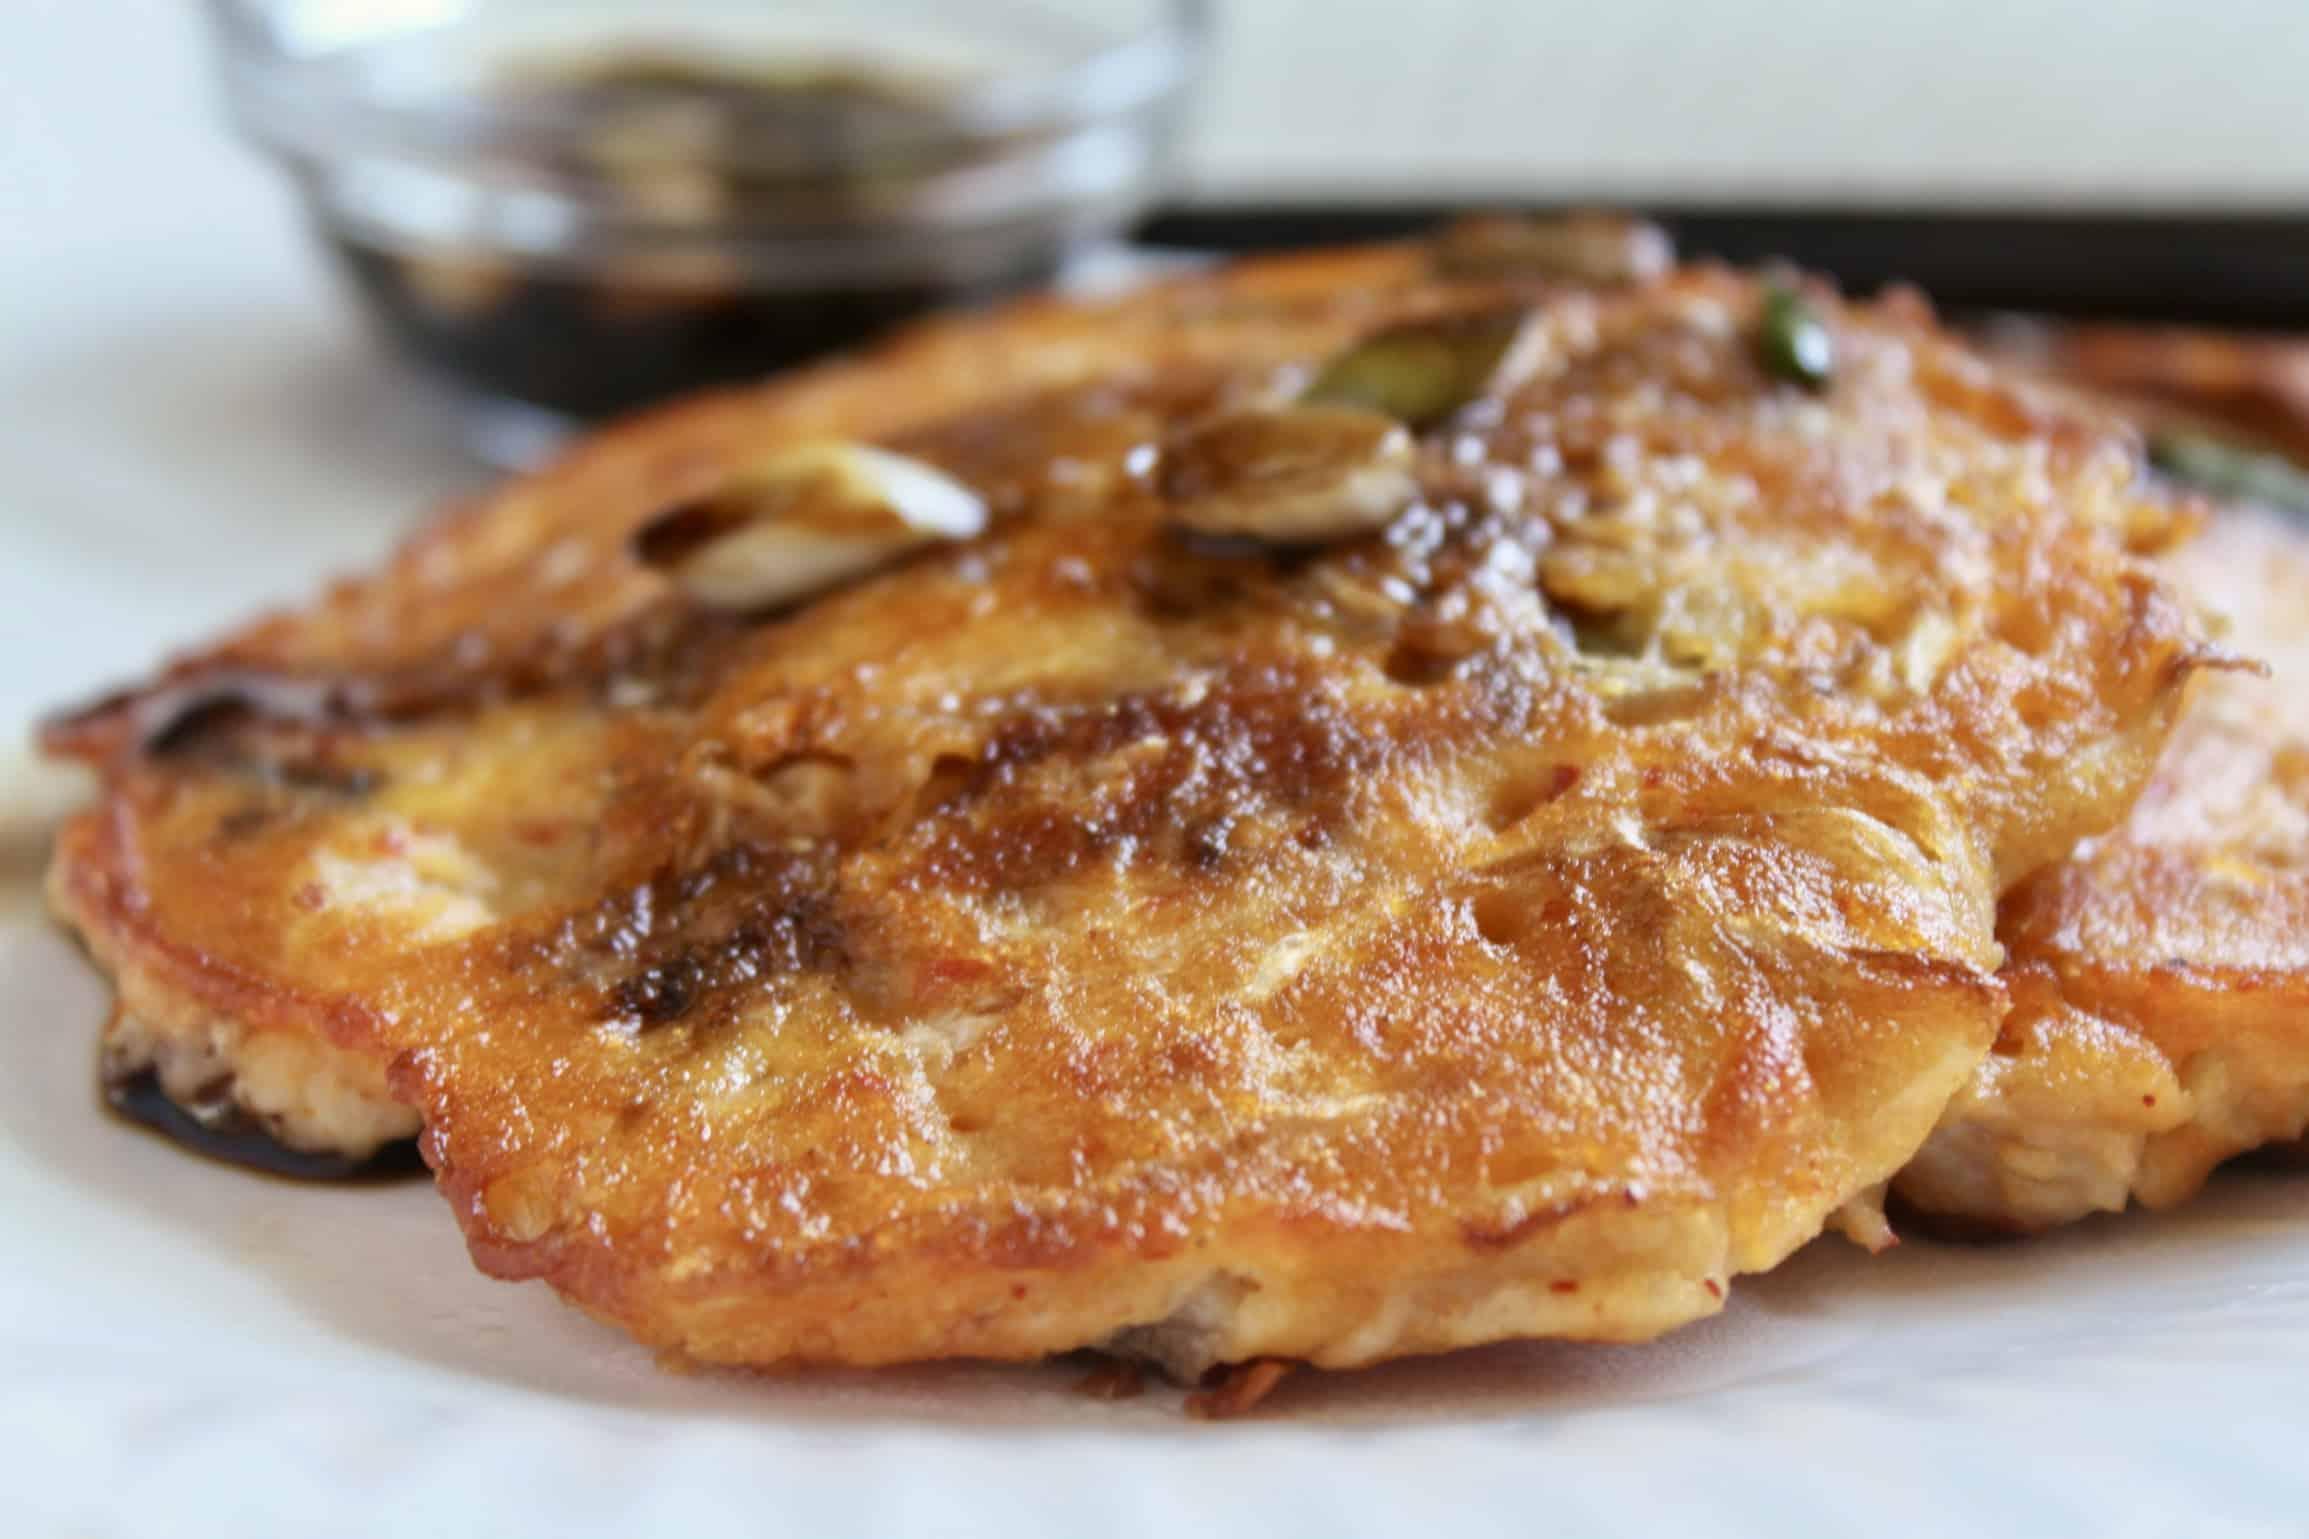 mung bean pancakes on a plate with chopsticks